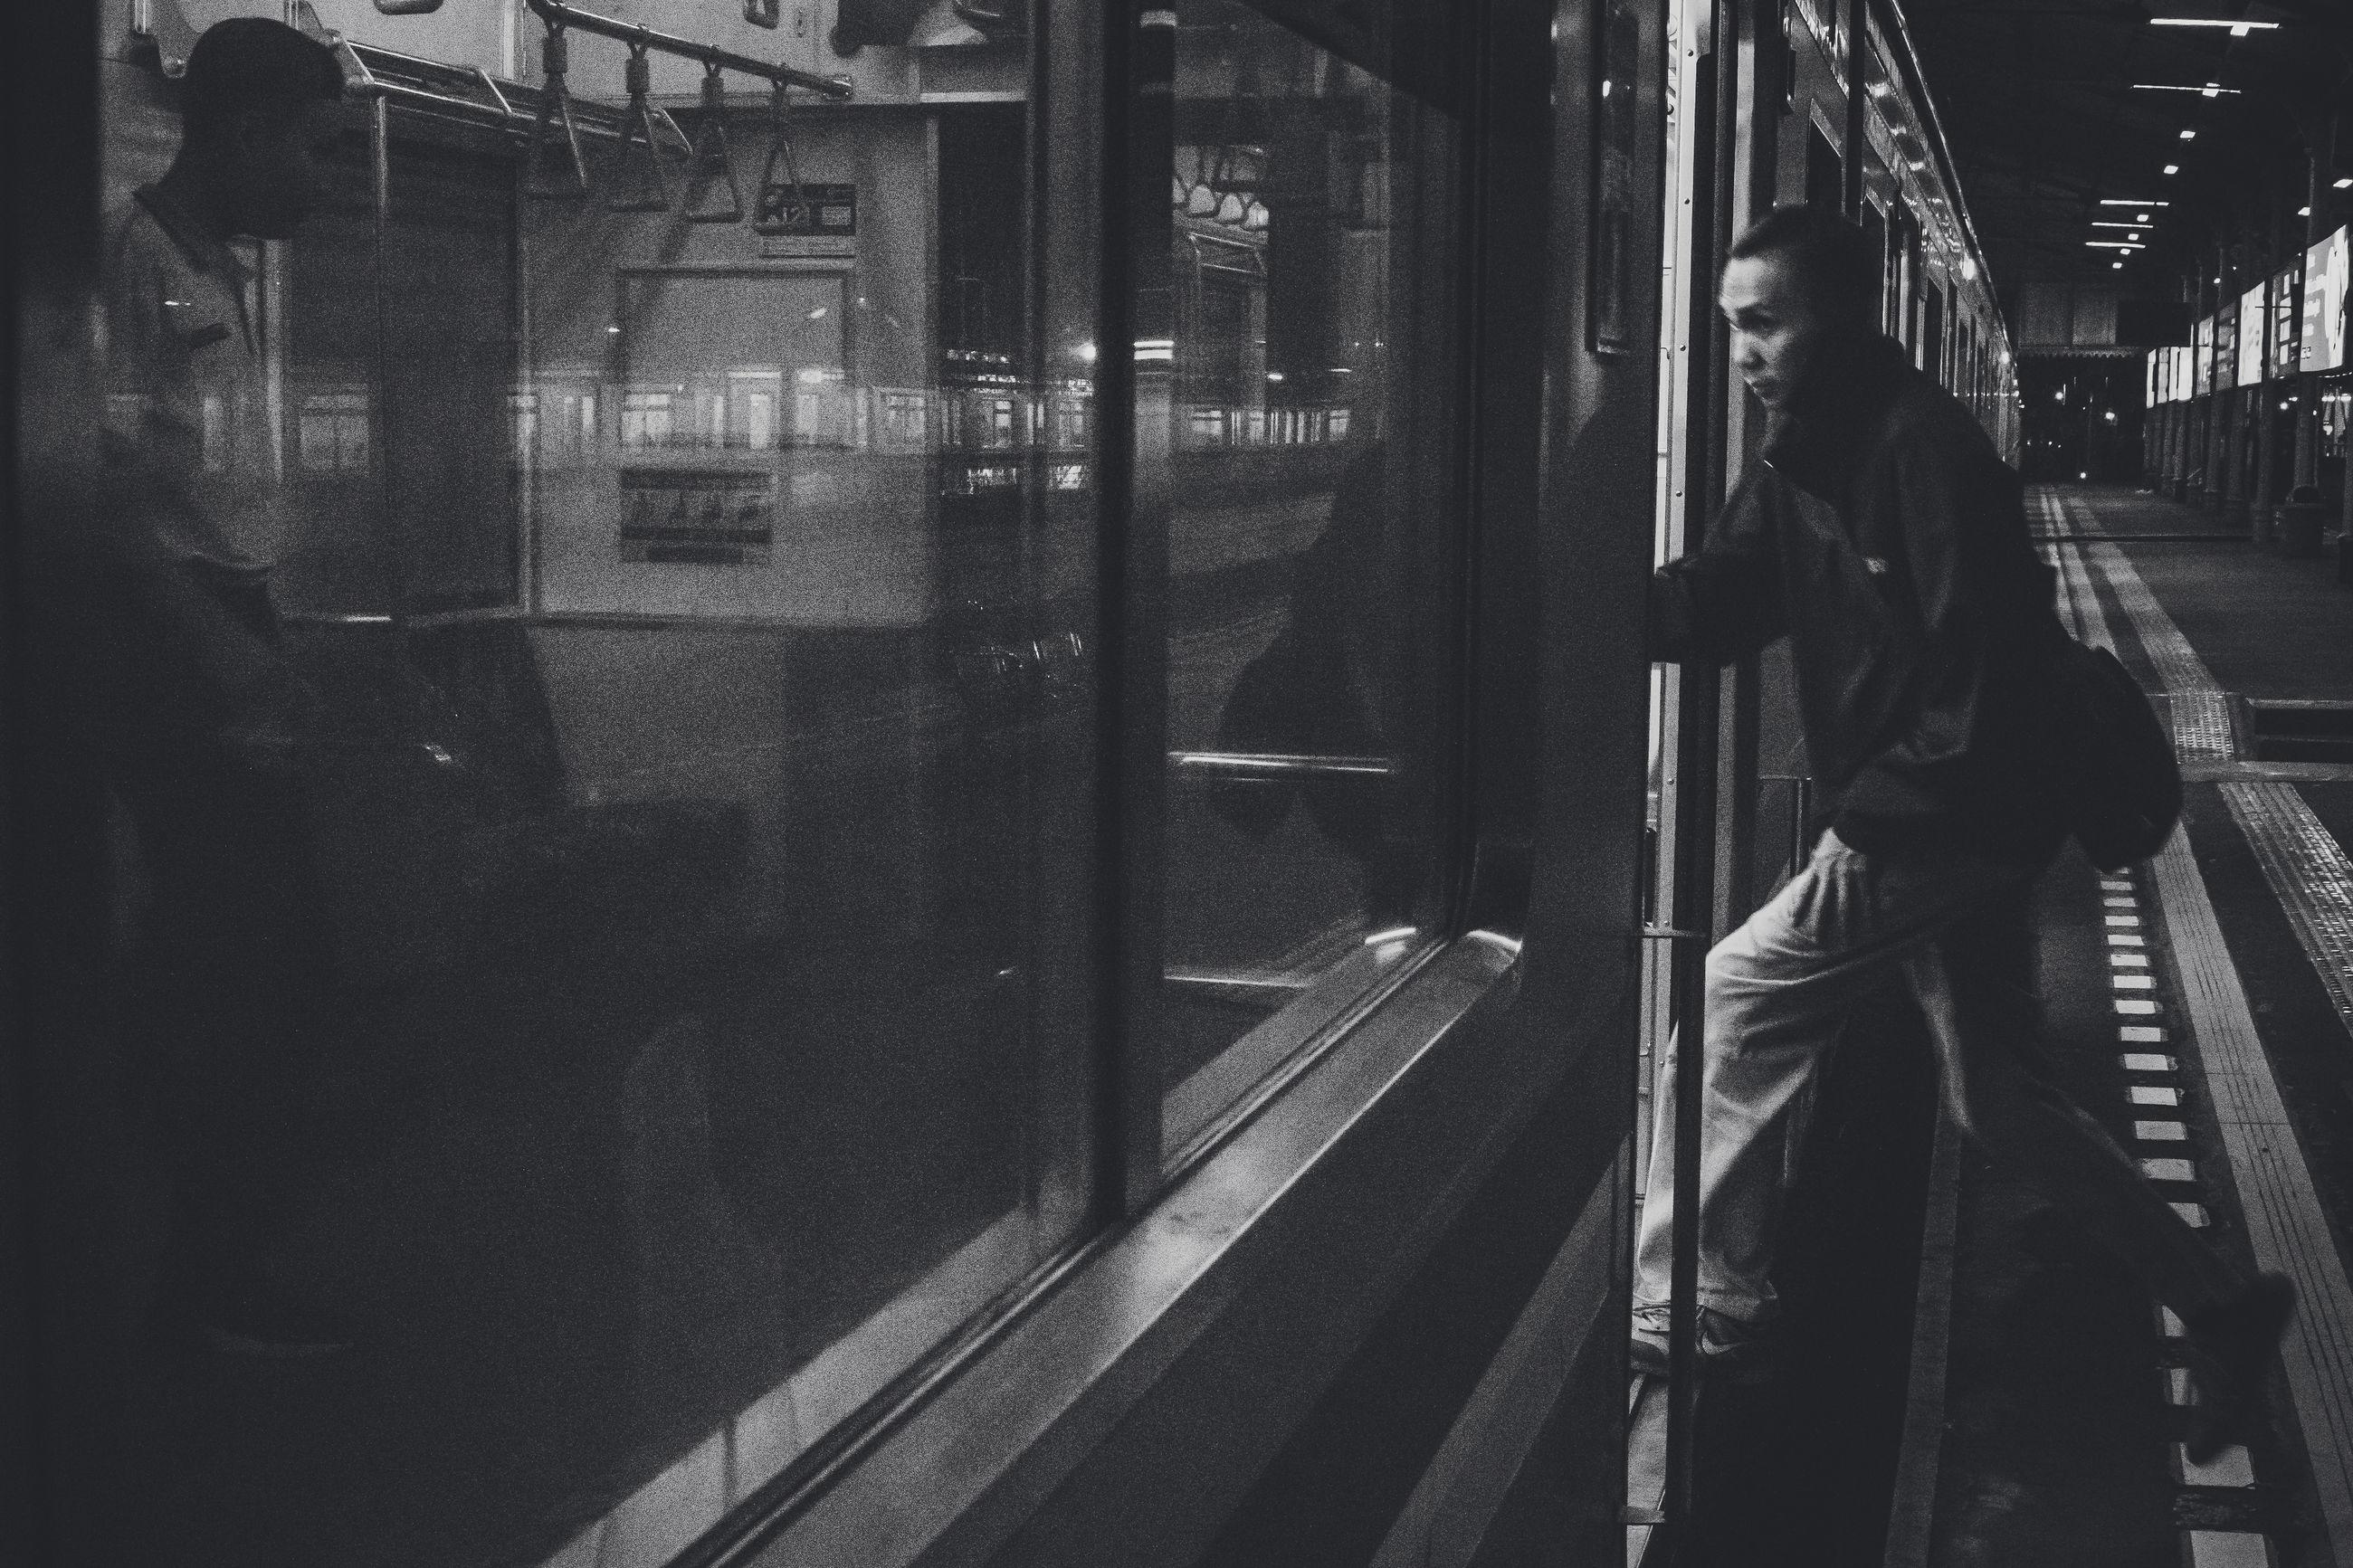 rail transportation, transportation, real people, public transportation, mode of transportation, train, train - vehicle, people, architecture, travel, railroad station platform, lifestyles, night, passenger, railroad station, reflection, city, window, motion